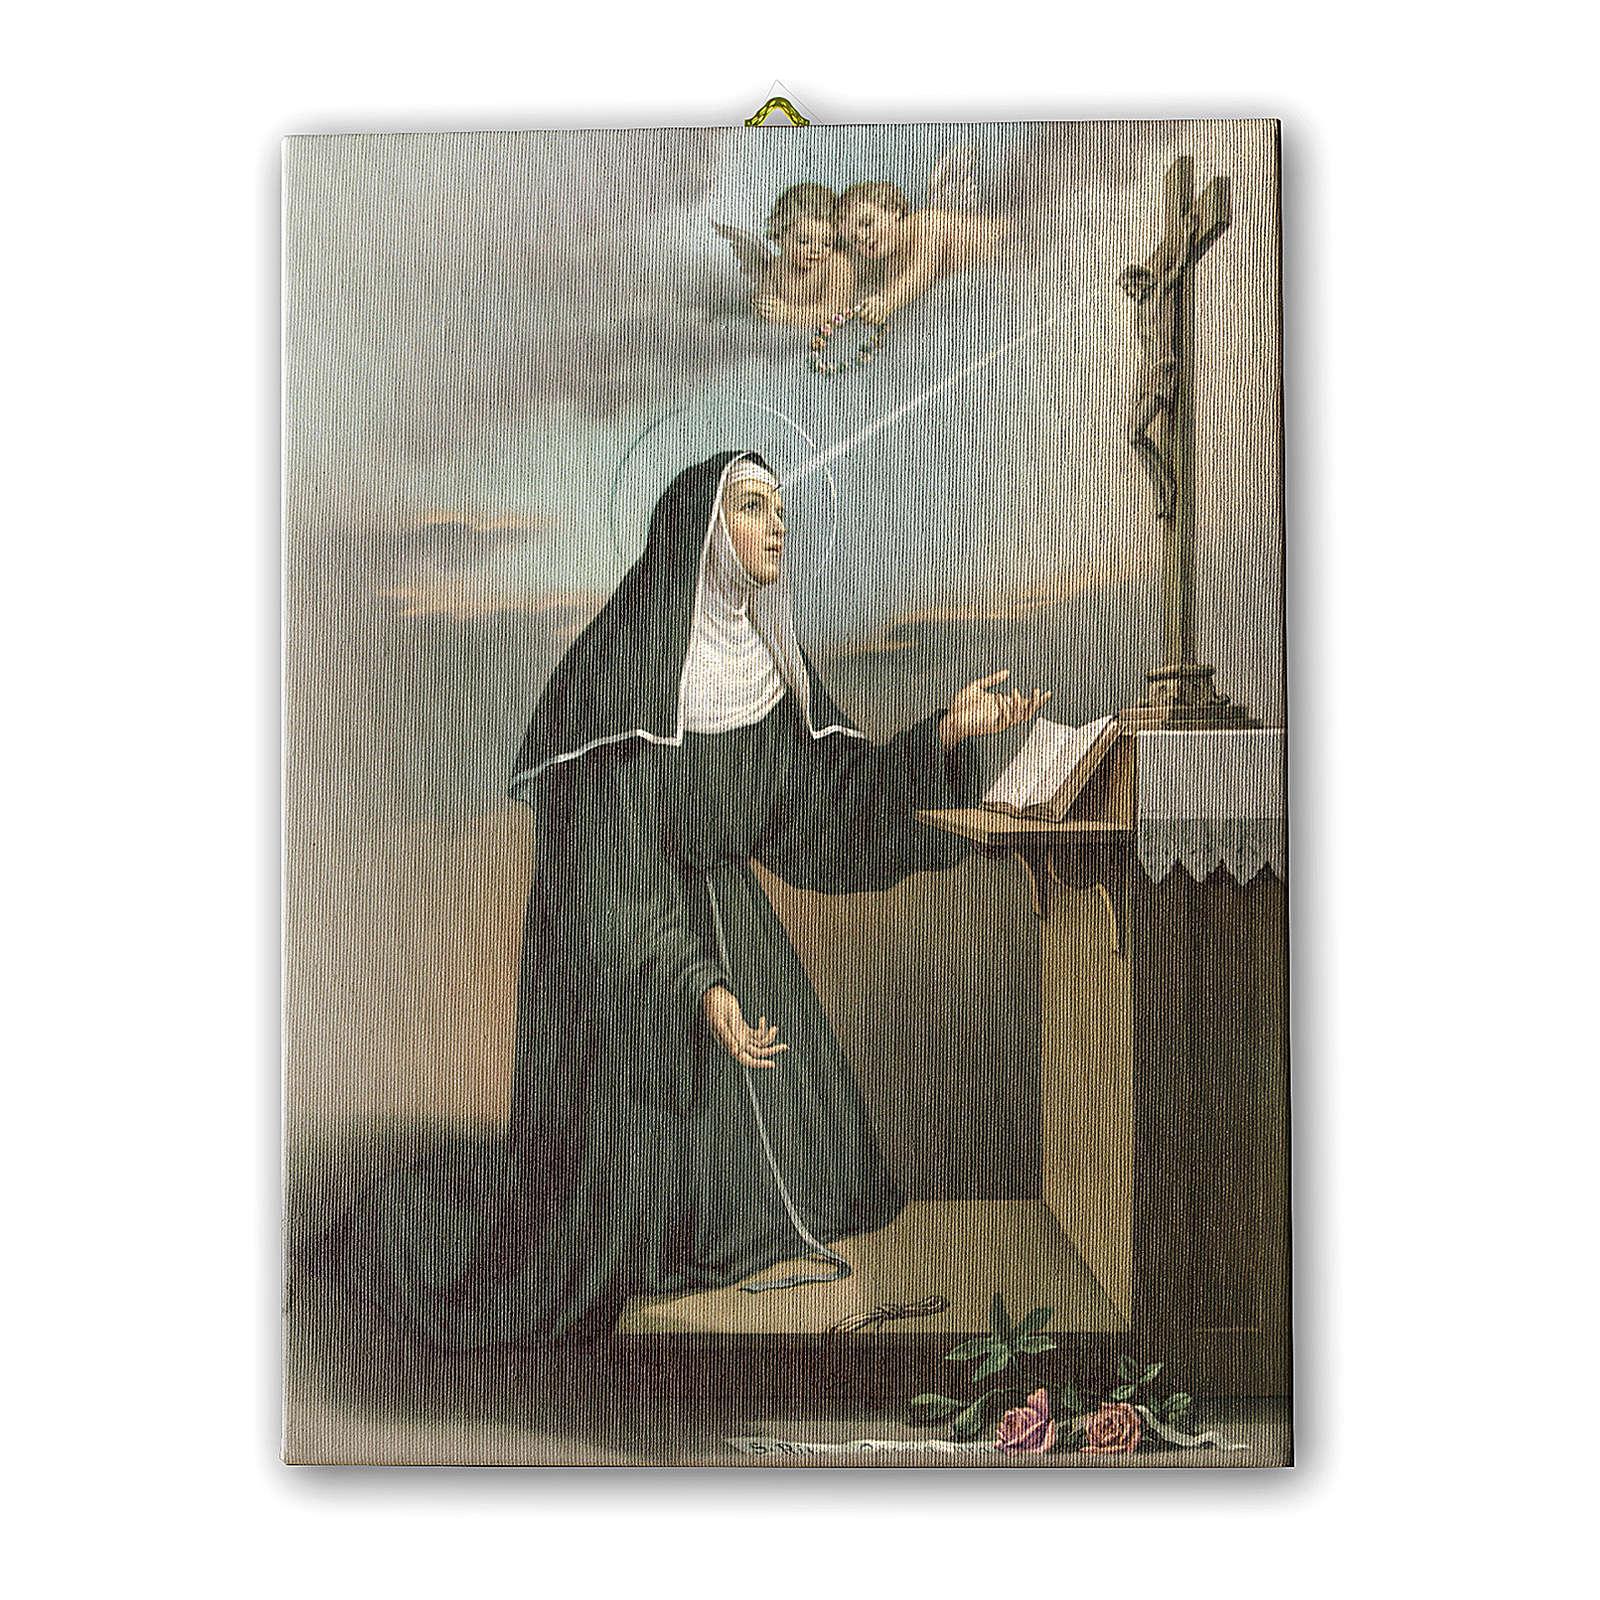 Saint Rita printed on canvas 25x20 cm 3